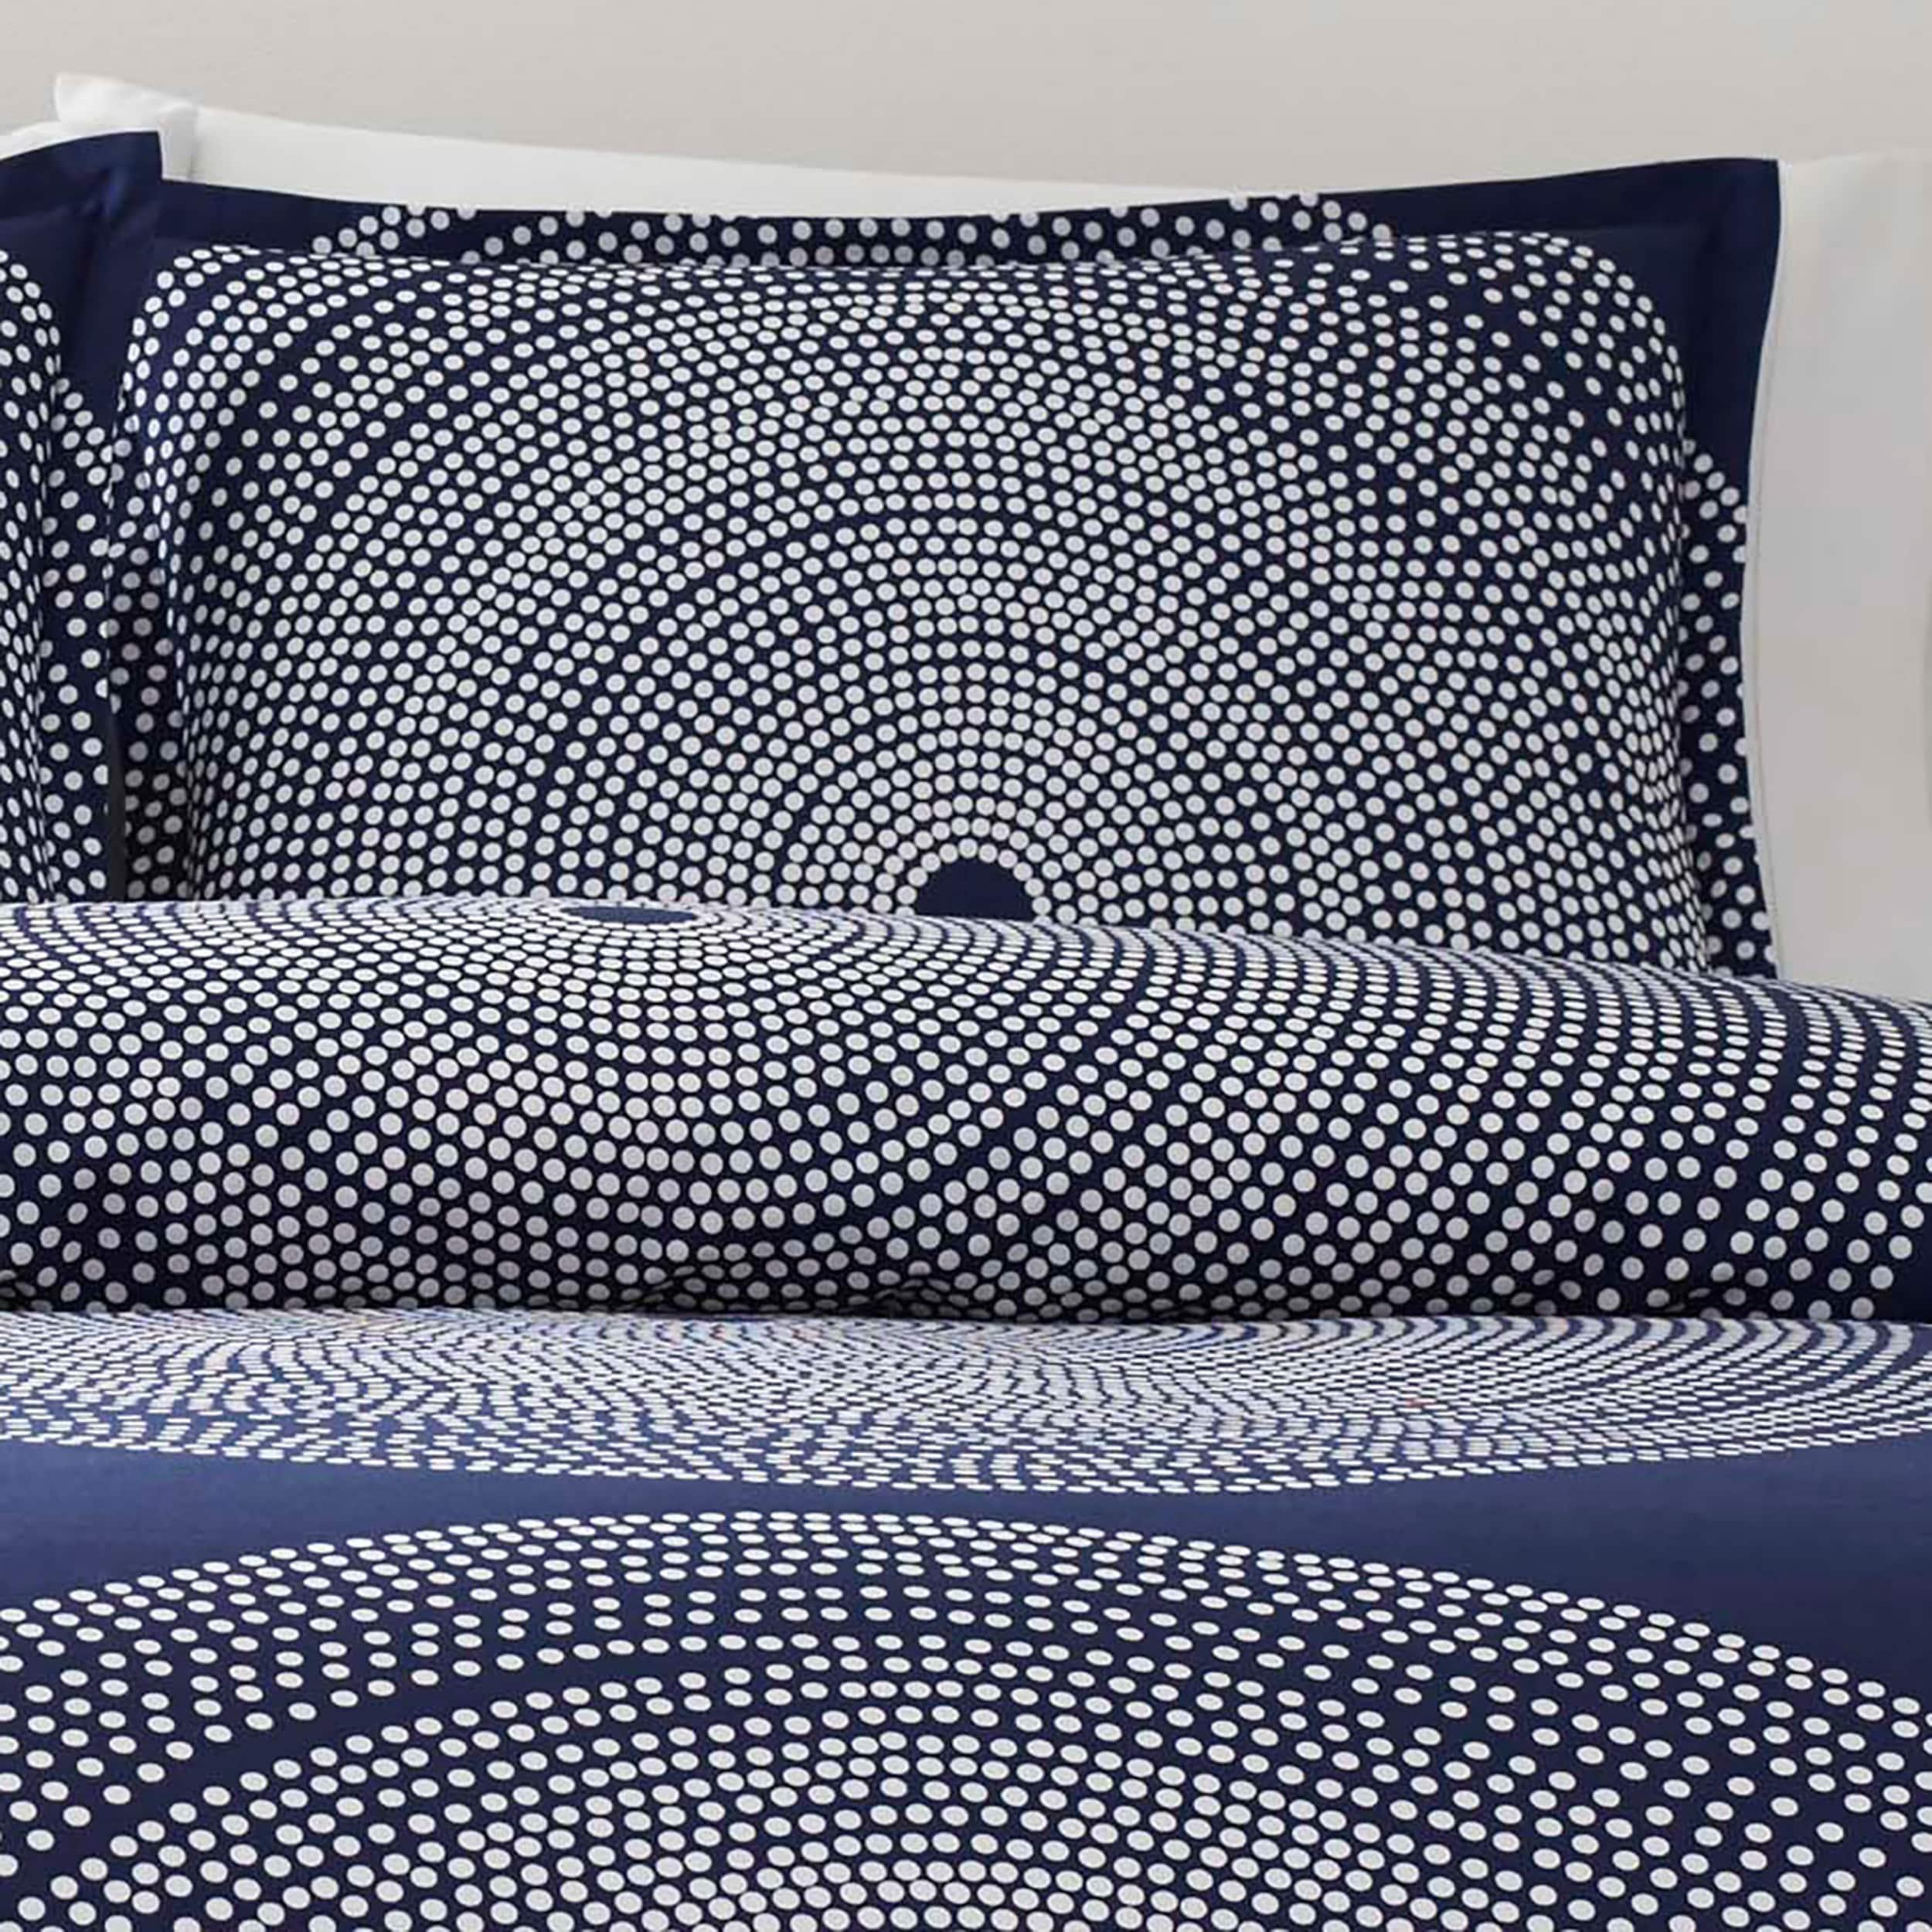 unikko design home duvet cover sweetgalas covers bed marimekko bedding and king